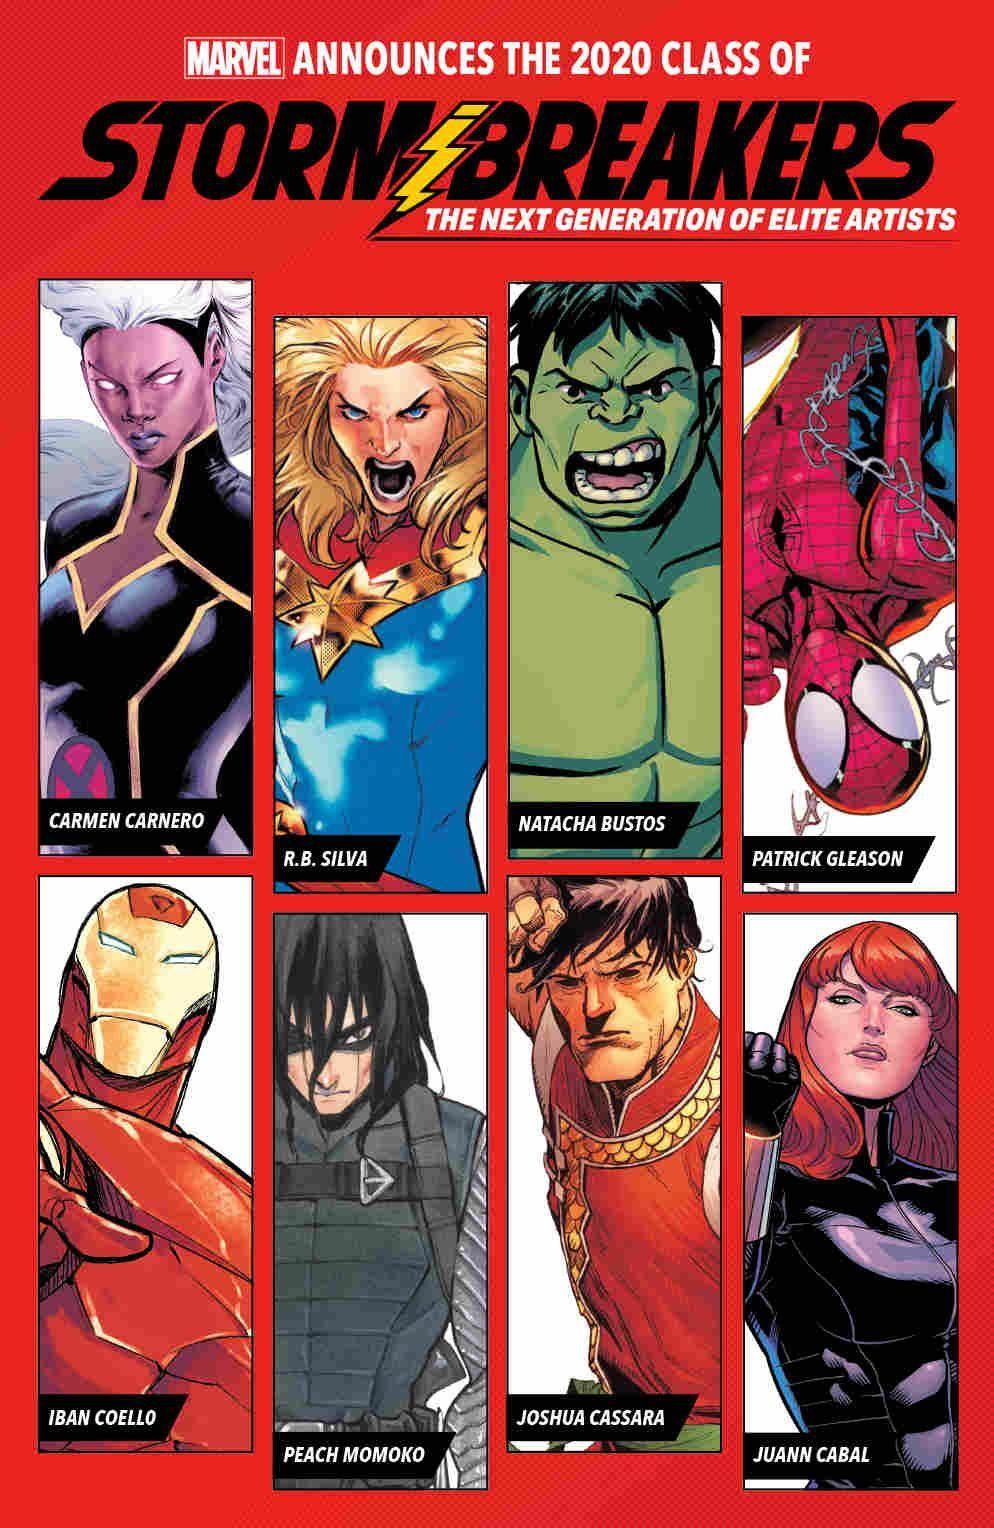 Marvel's Stormbreakers Announcement